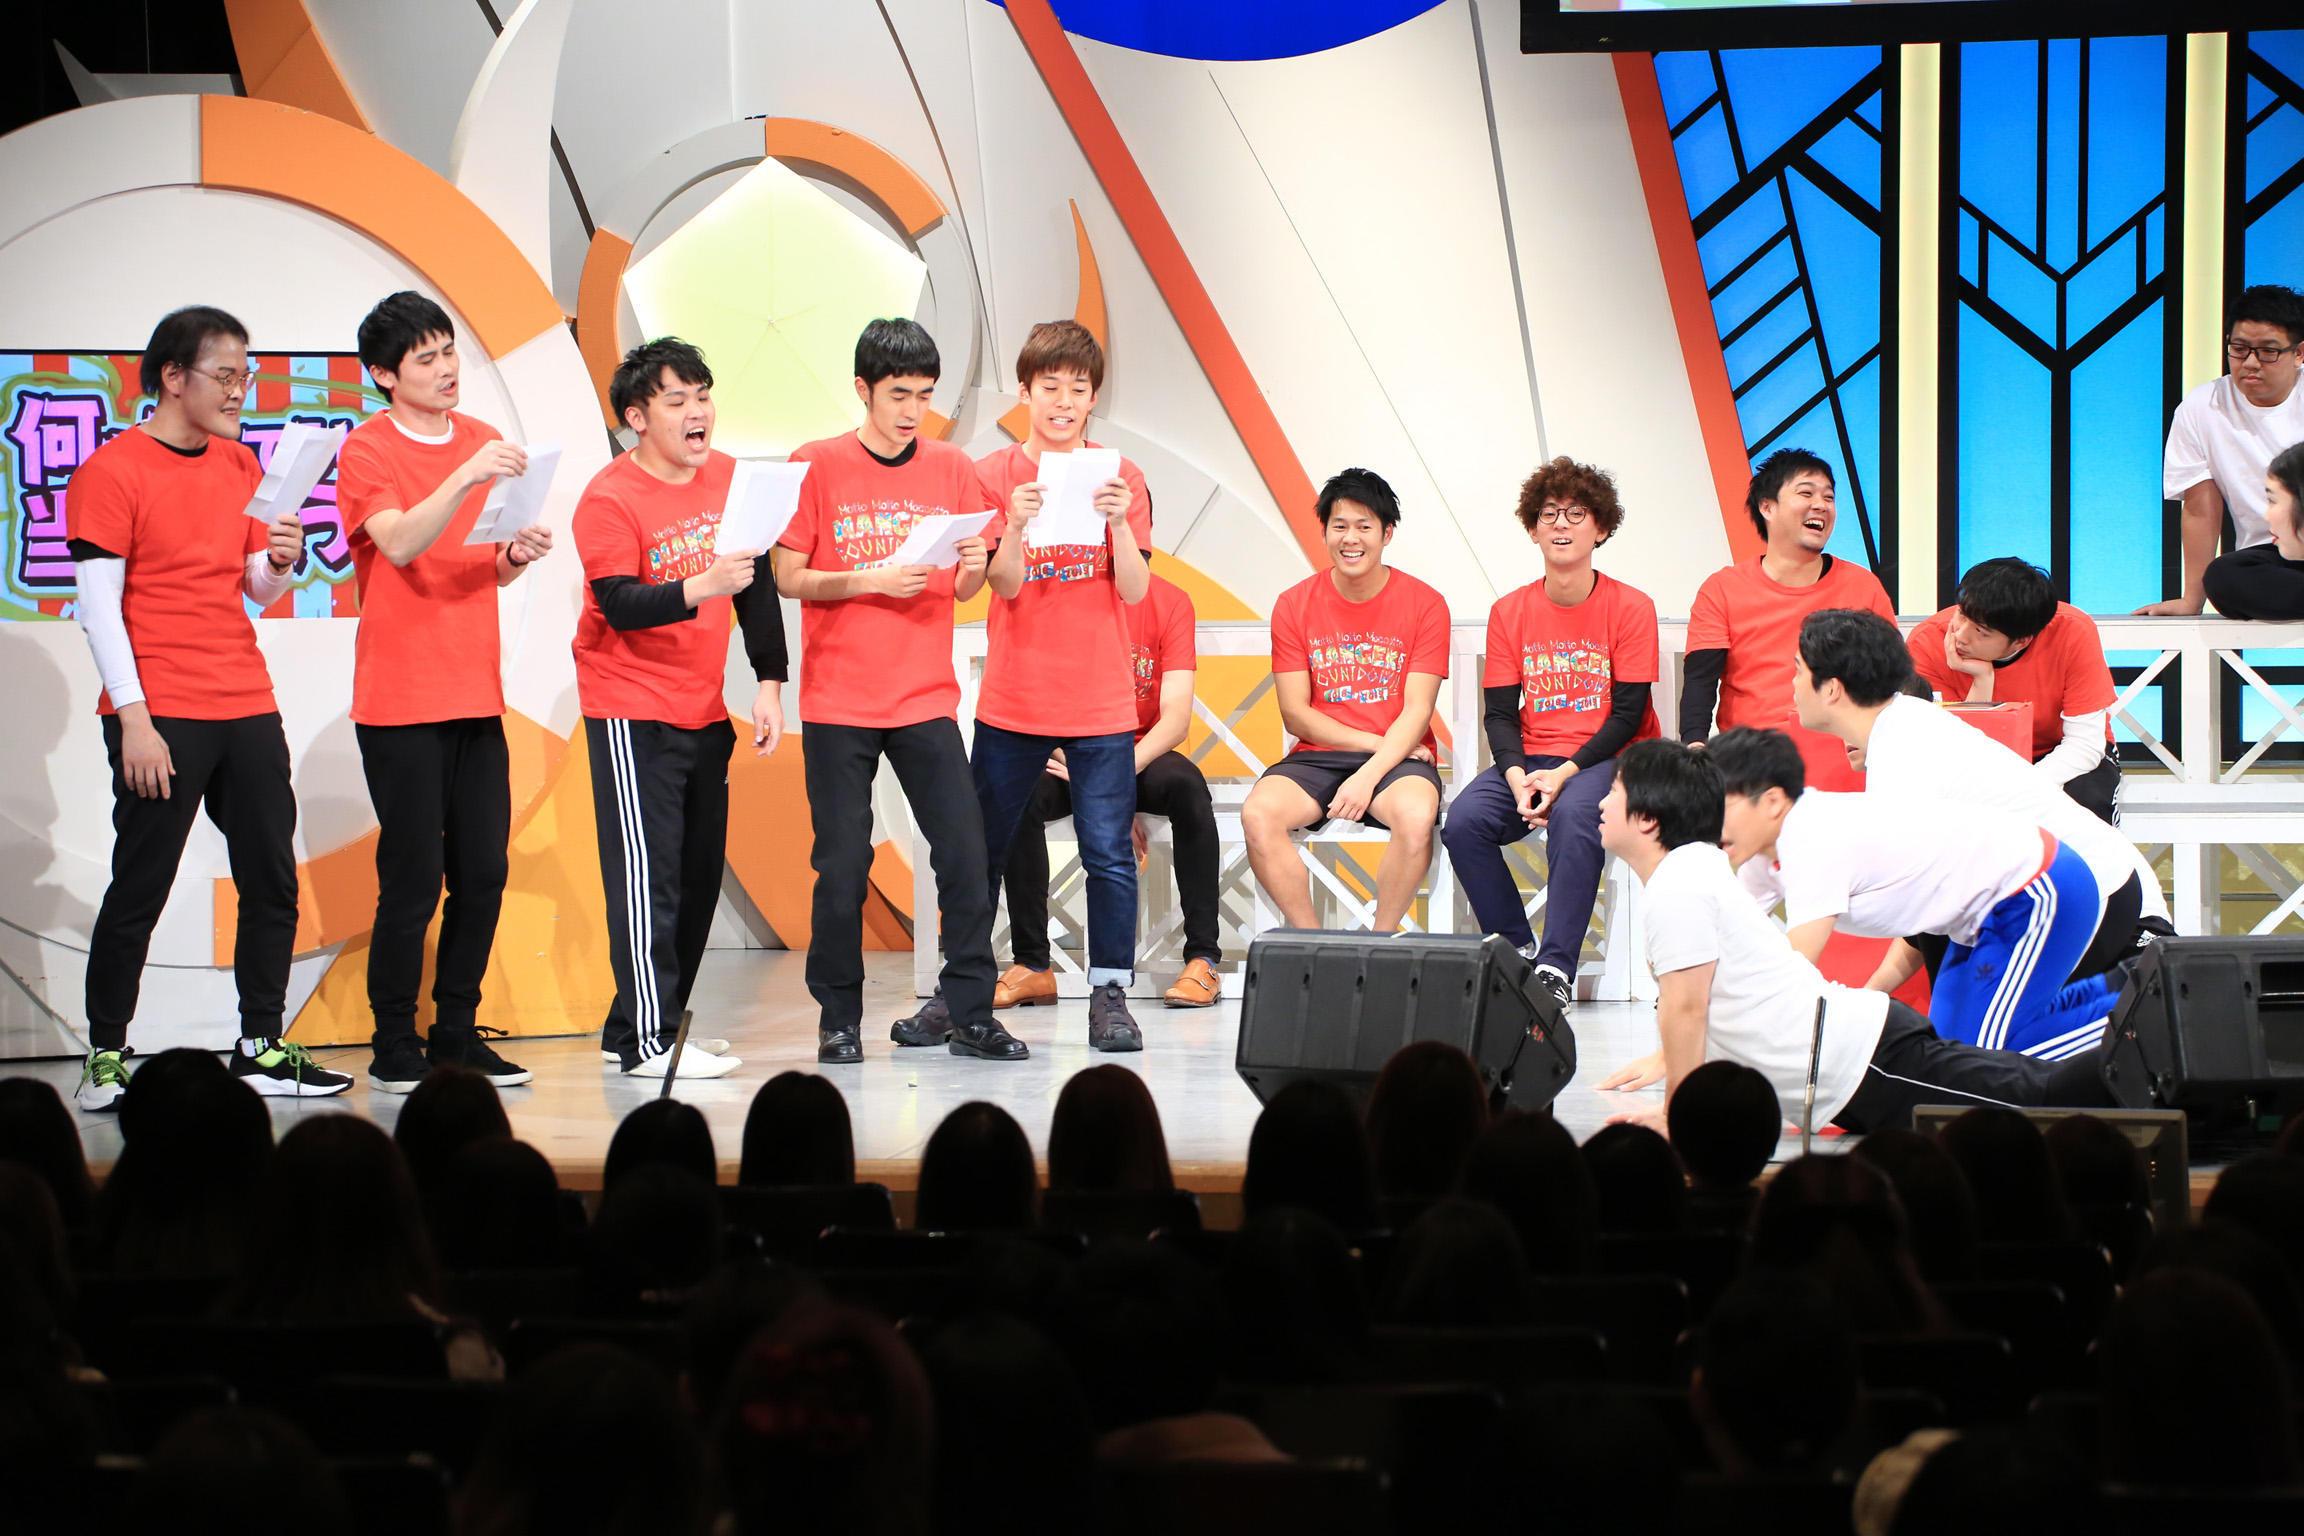 http://news.yoshimoto.co.jp/20190101110127-490d5f11db5d010342c20d94743032408b69c149.jpg